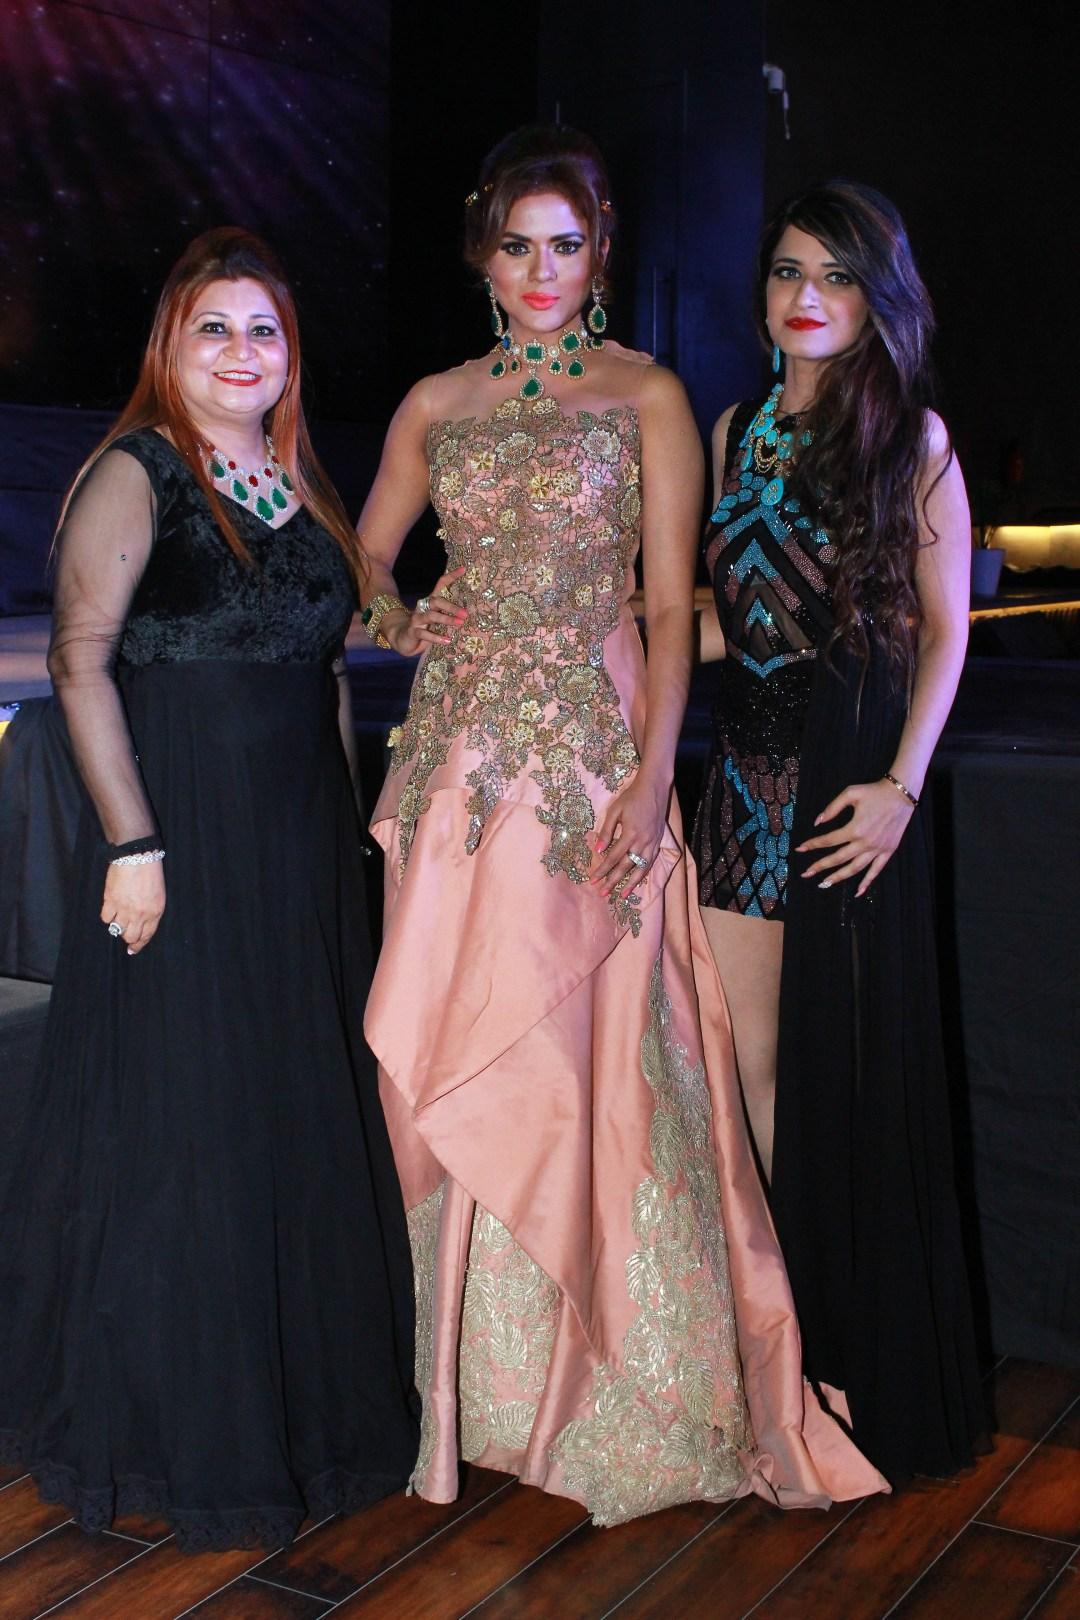 Kusum Jain, Amanpreet Wahi and Tanaya Walia